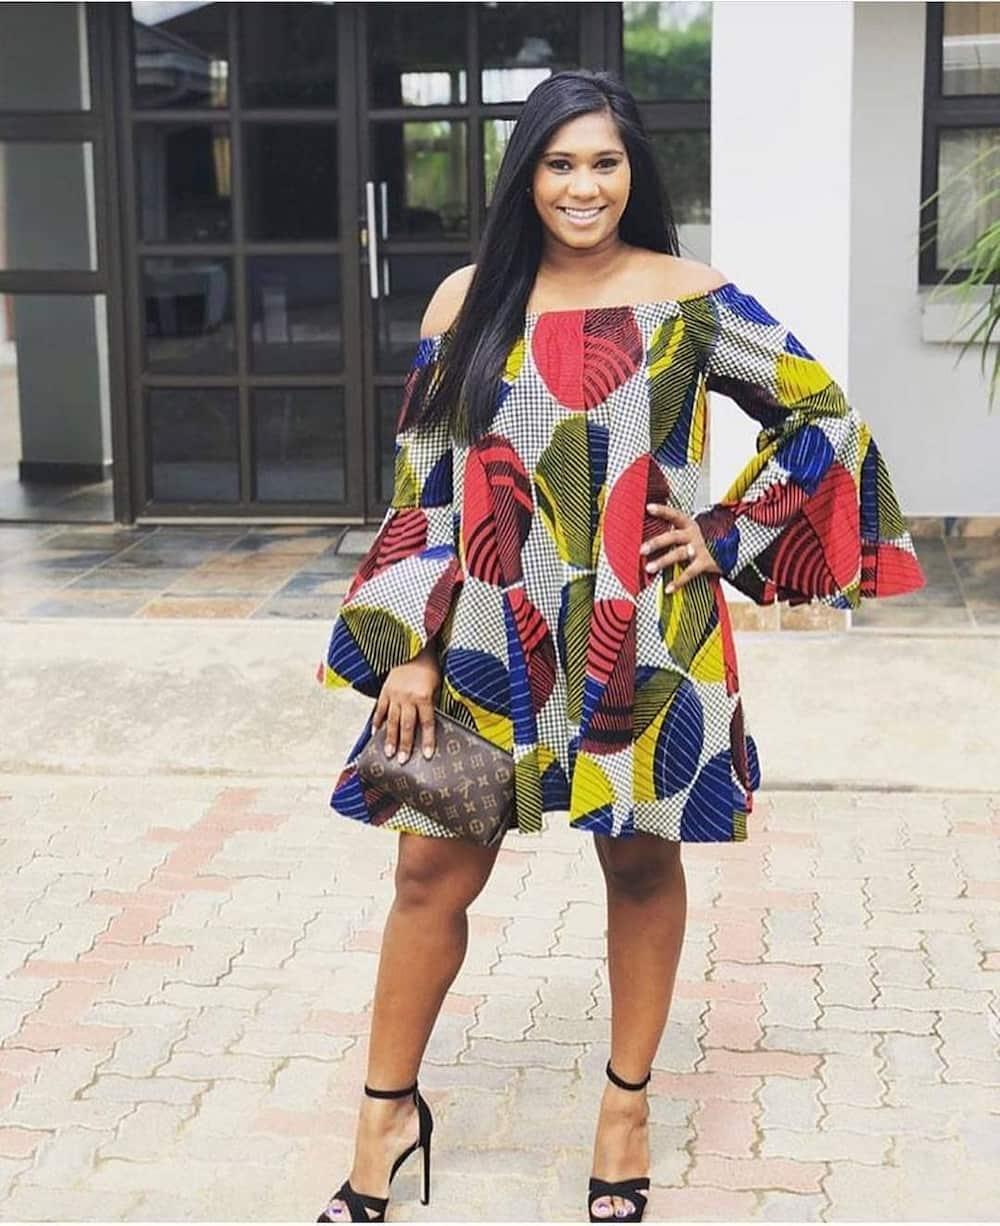 Top 20 Latest Ankara Styles Designs 2019: 2019 Latest Nigerian Ankara Styles